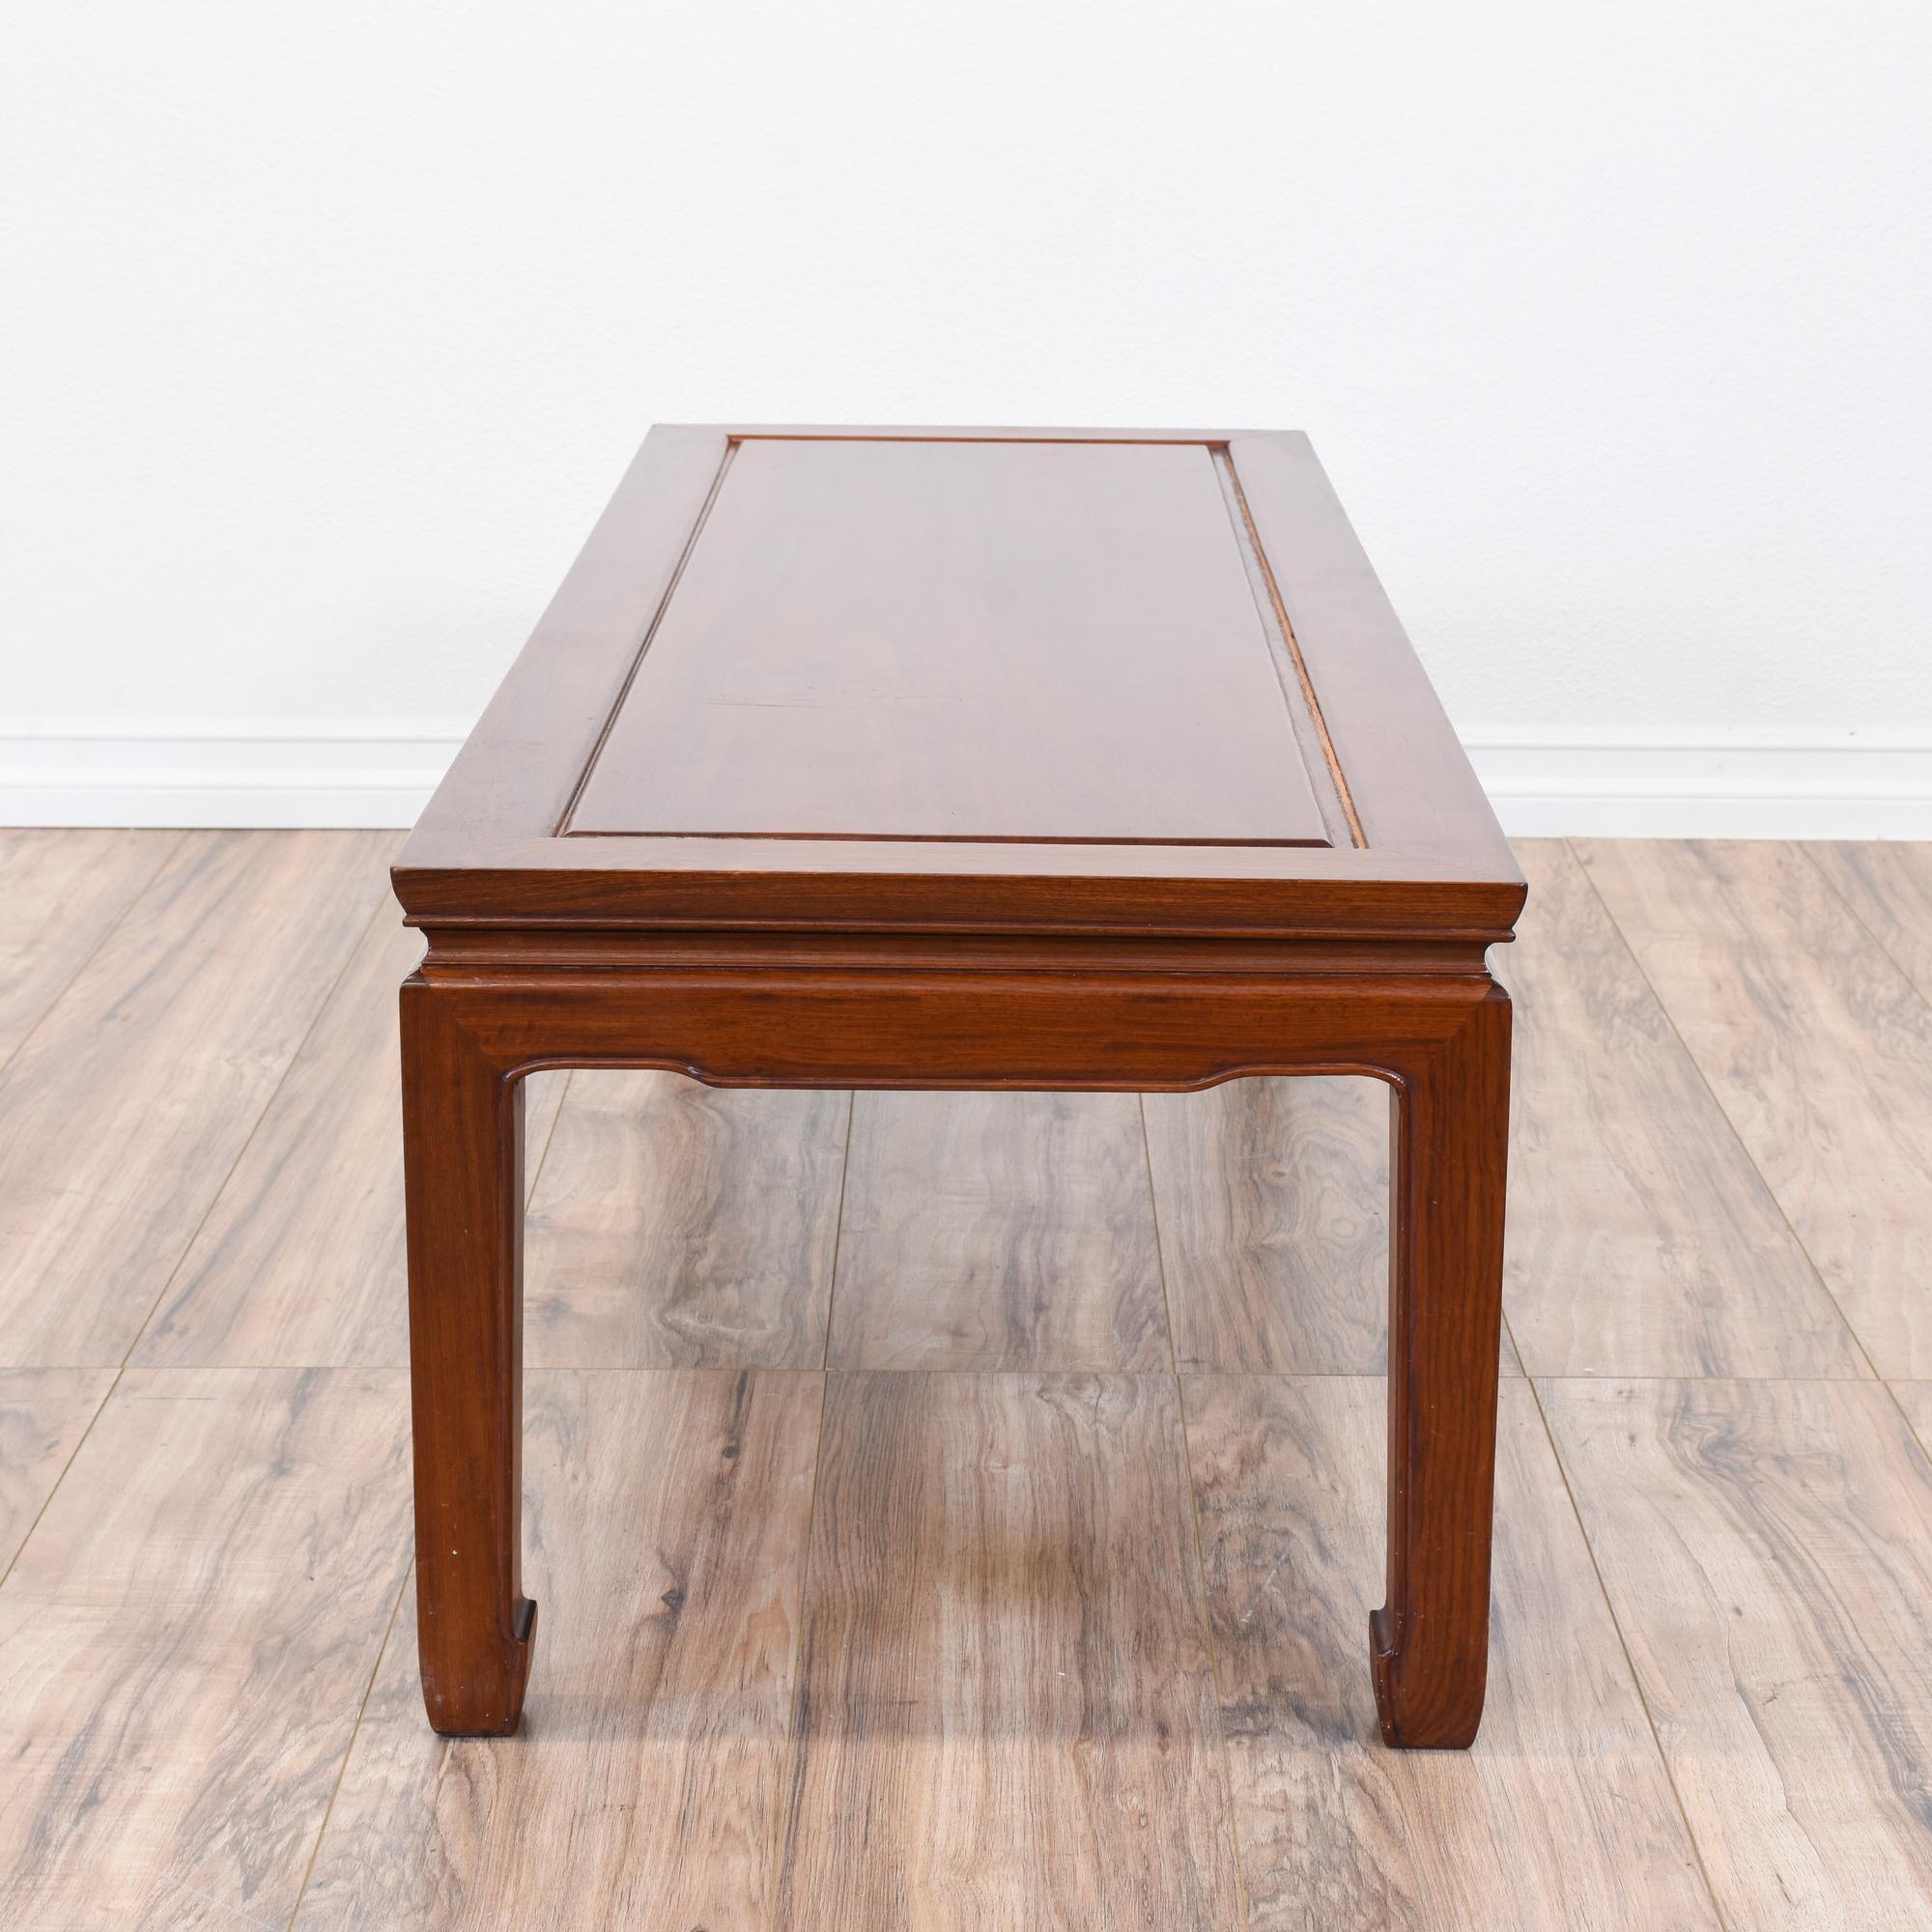 Carved Asian Inspired Teak Coffee Table Loveseat Vintage Furniture San Diego Los Angeles